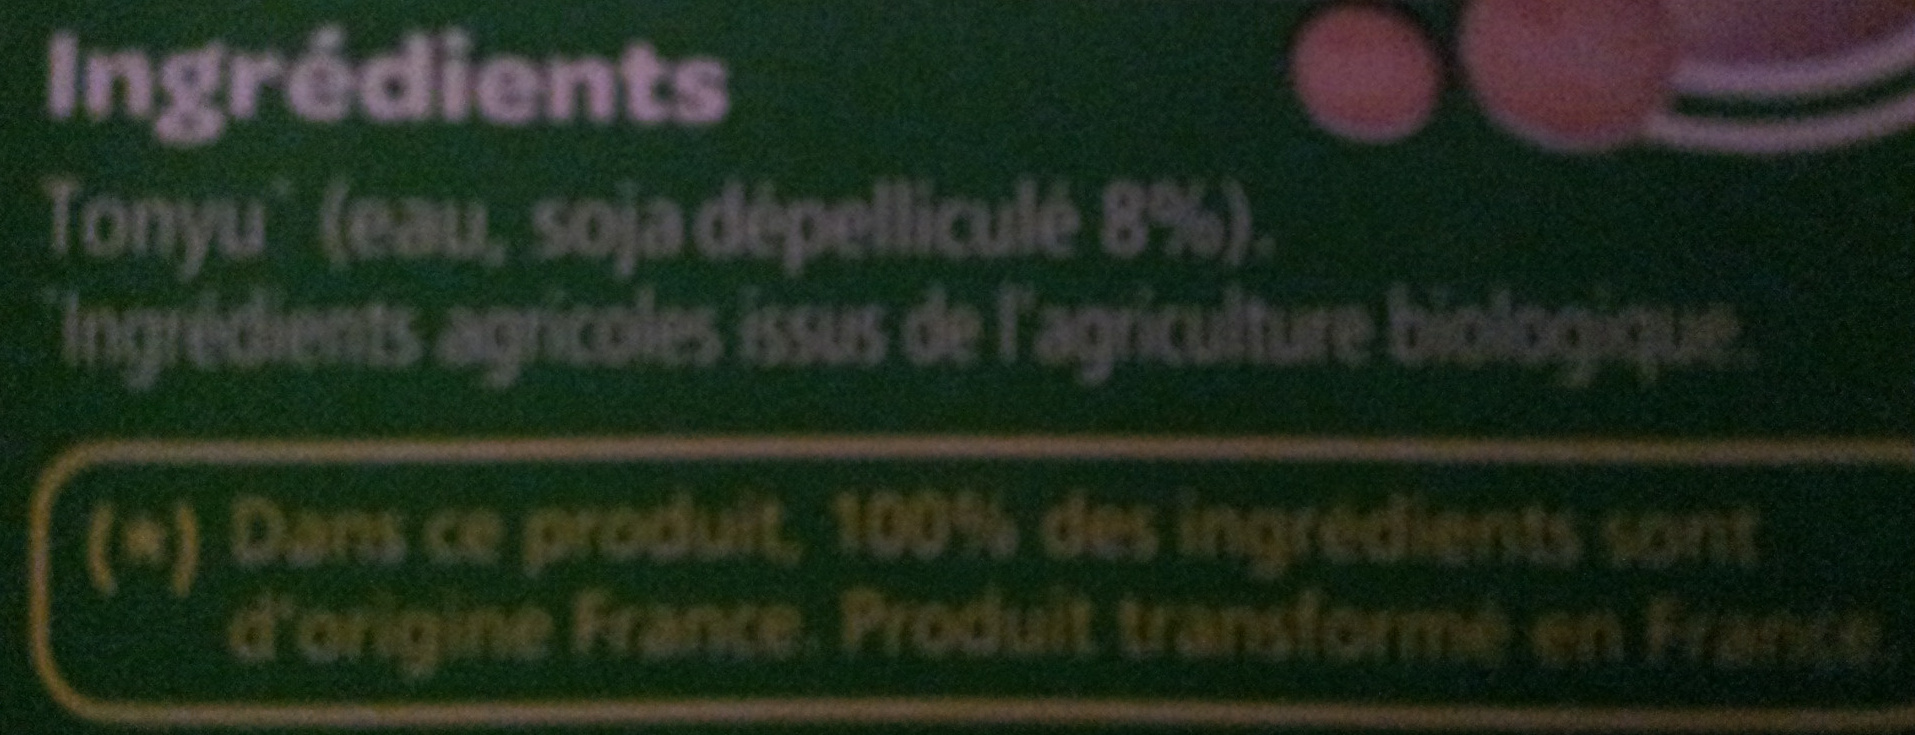 Boisson Soja Nature Bio  - Ingrédients